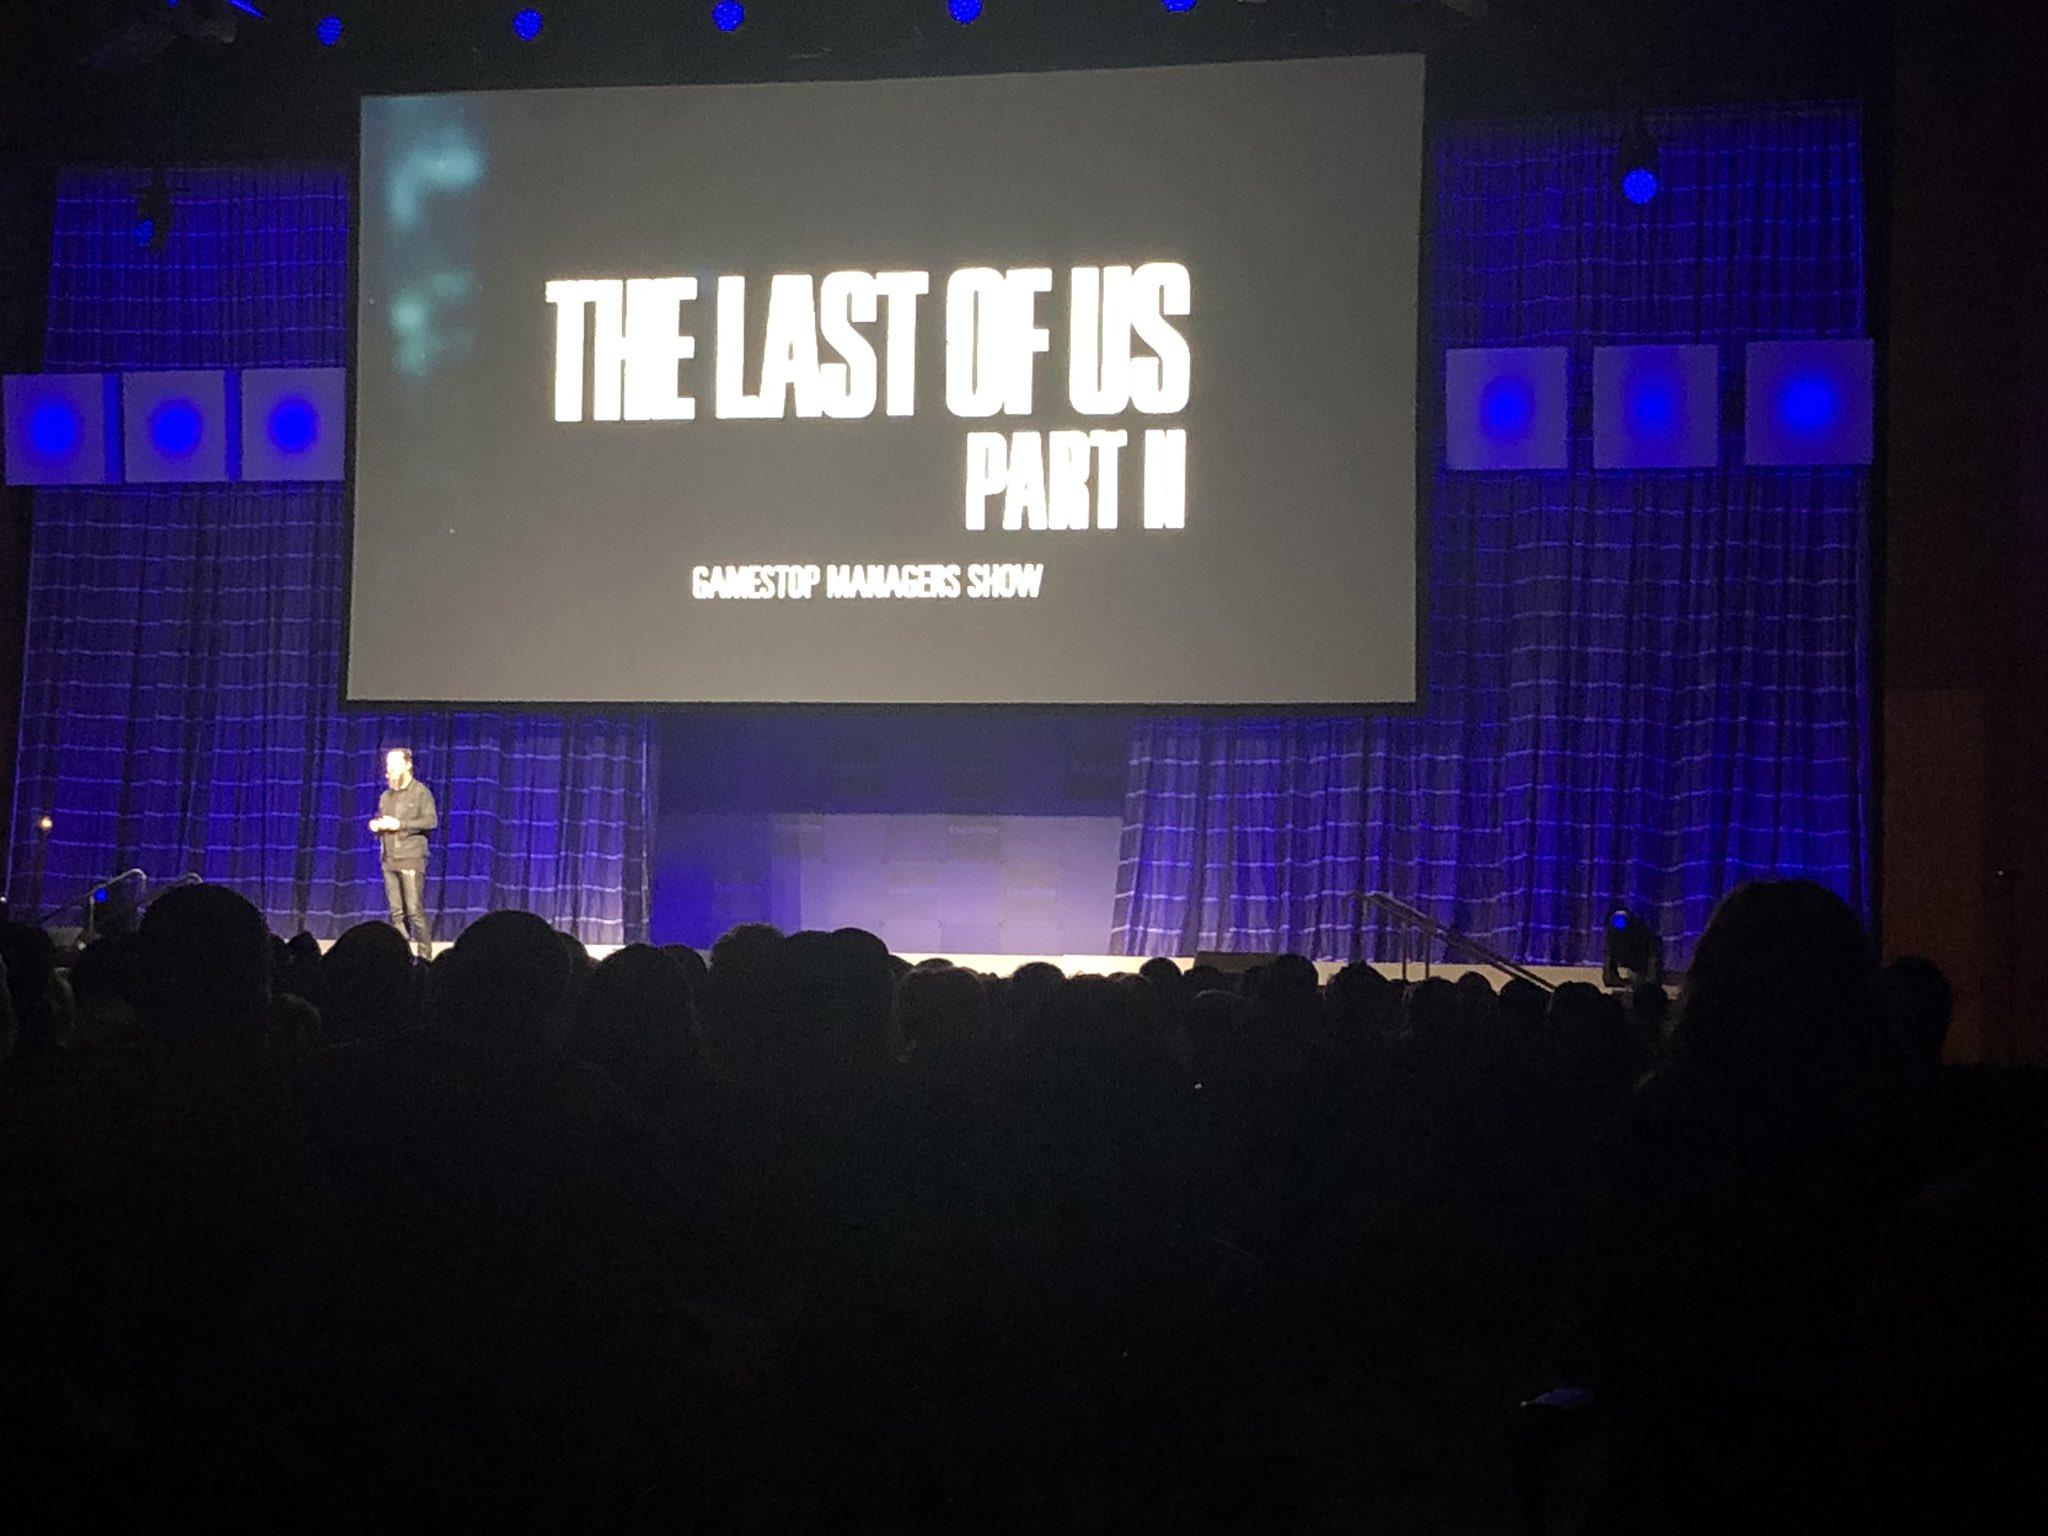 GameStop провел закрытую демонстрацию The Last of Us Part II